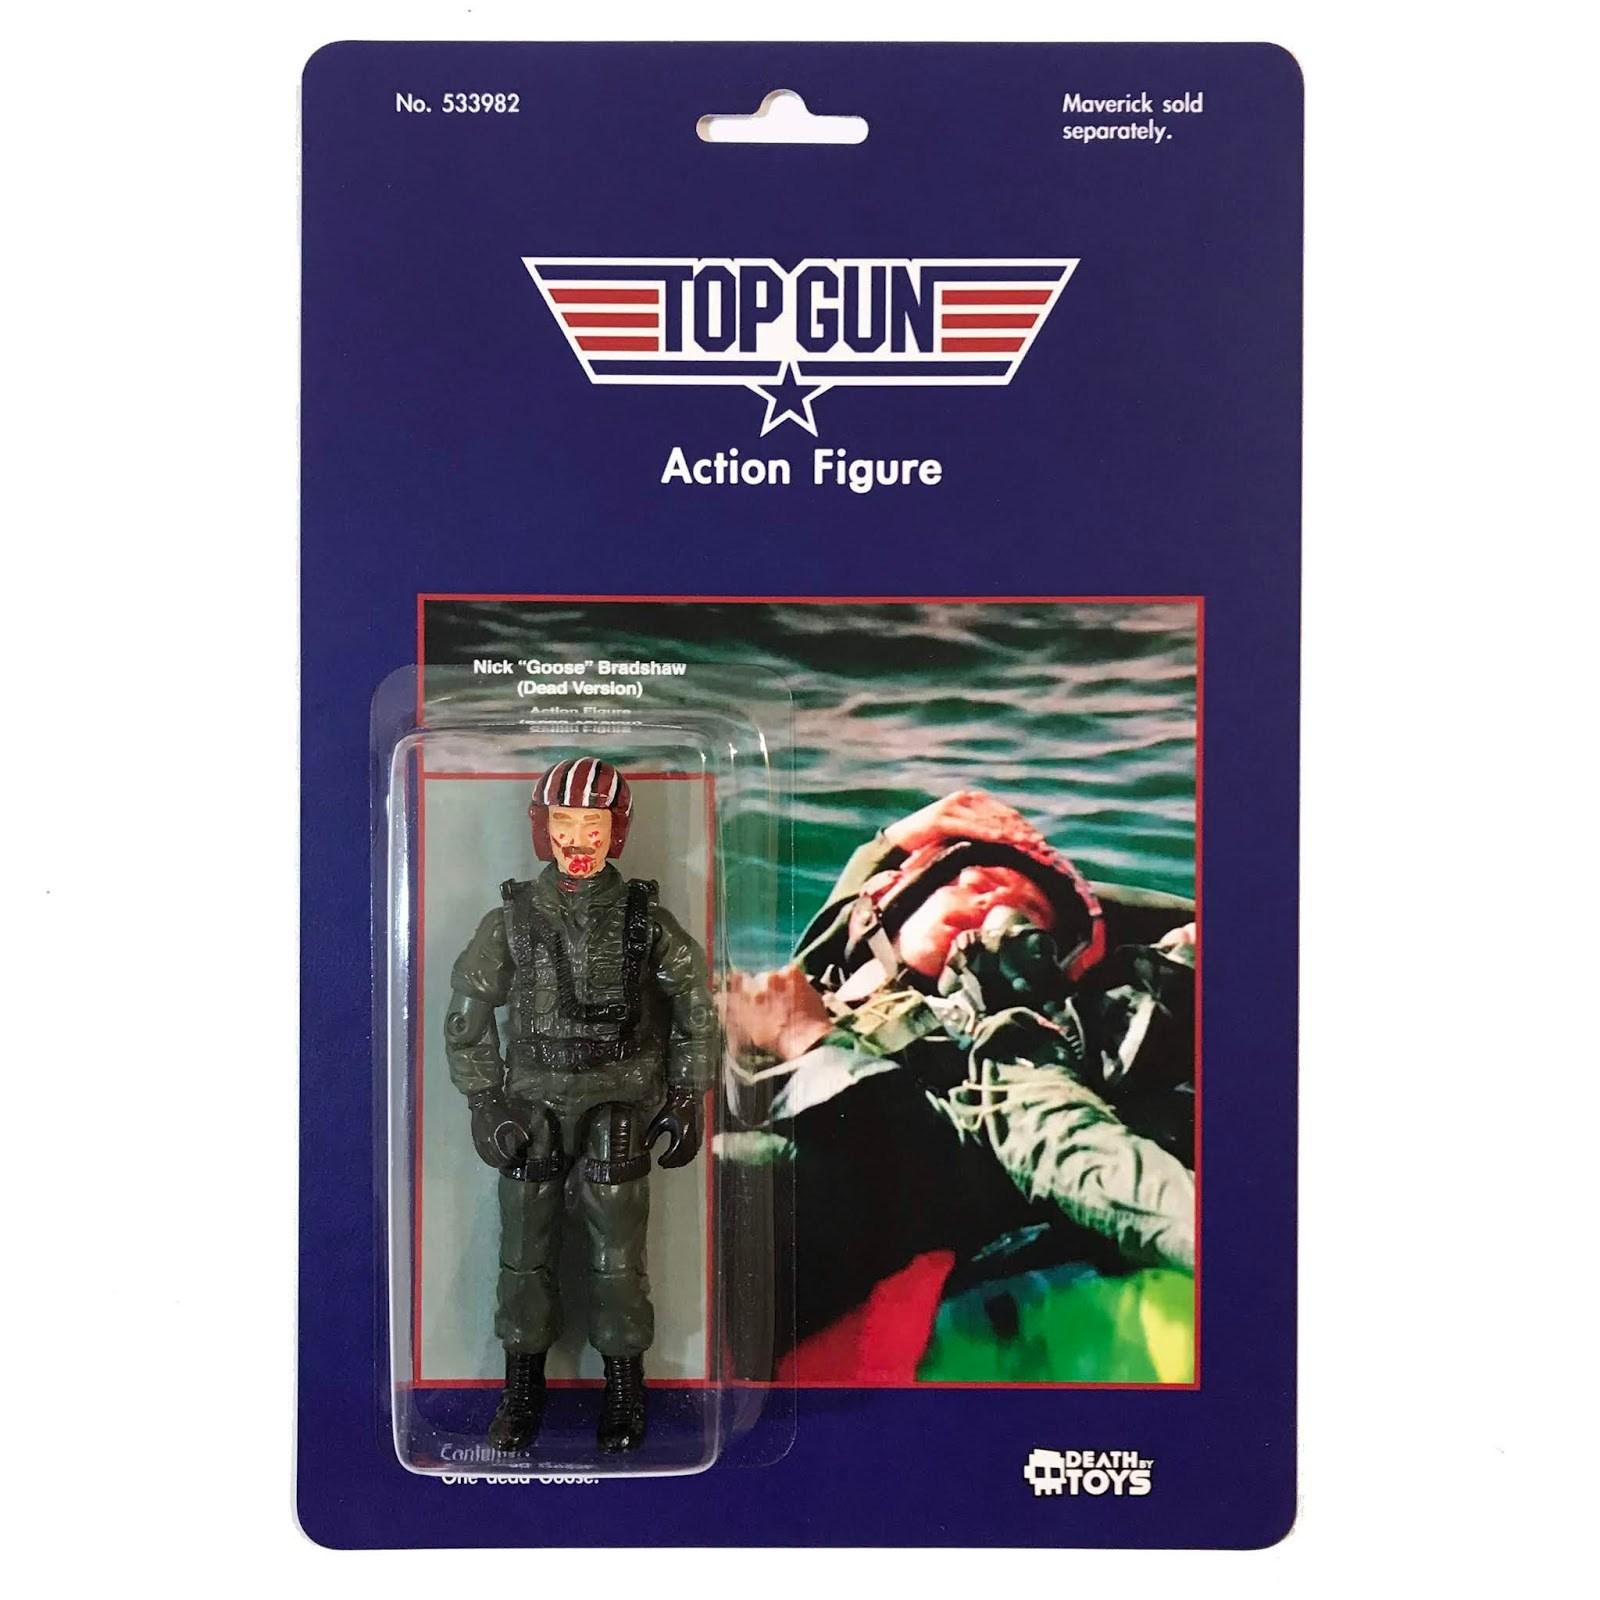 Dan Polydoris action figures customizzate morti anni '80 (4)